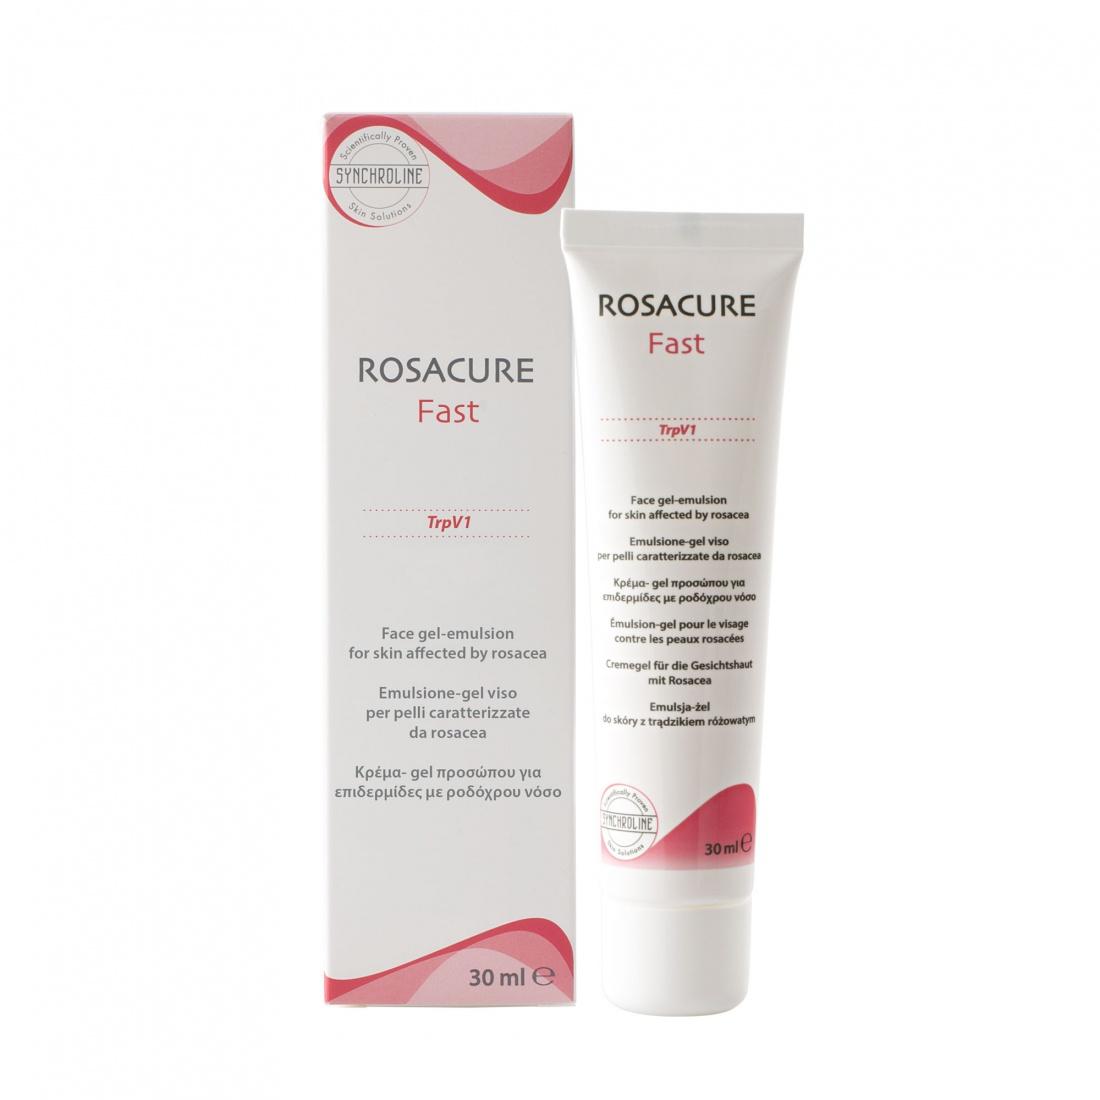 Synchroline Rosacure Fast Cream/Gel